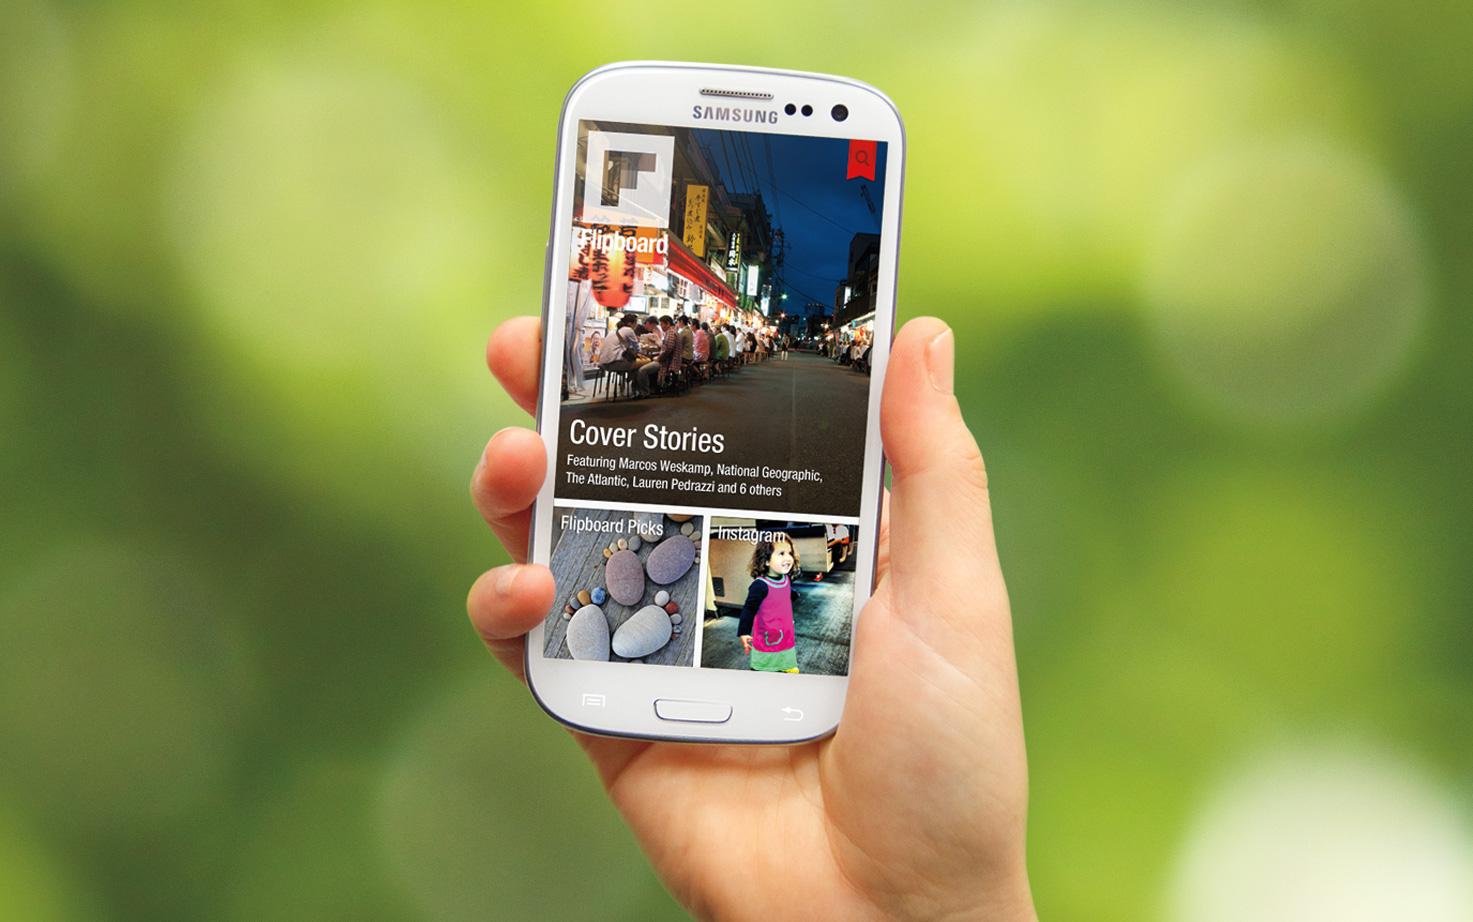 Track Samsung Phone Using Iphone